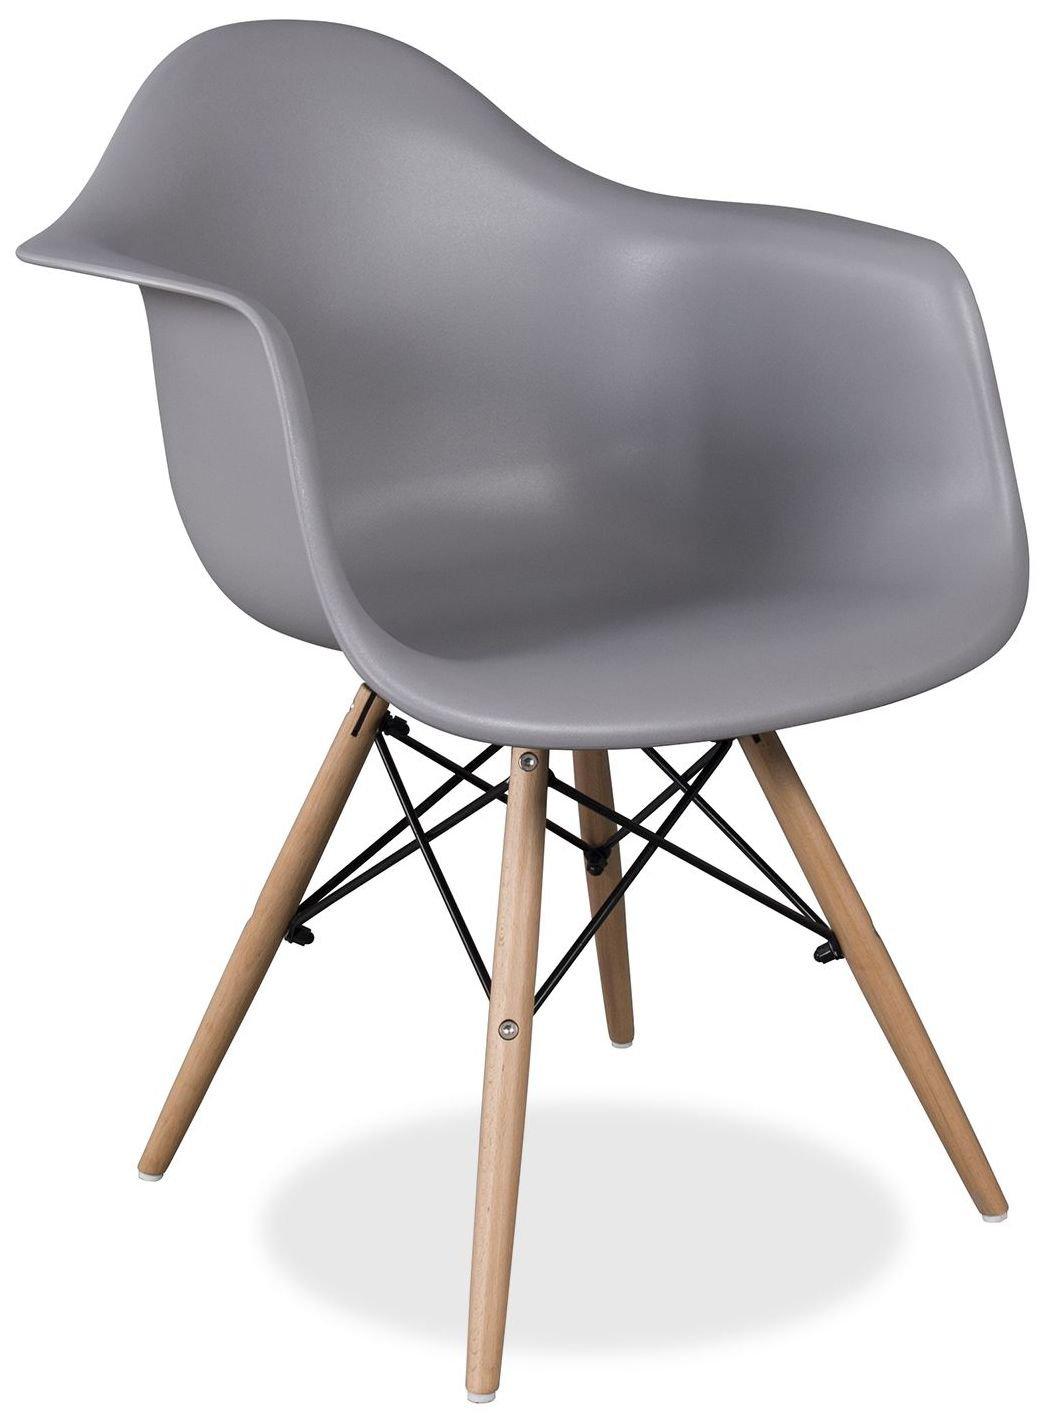 Zolta Stuhl Weiß Schalenstuhl Sessel Plastikstuhl Retro Kuche